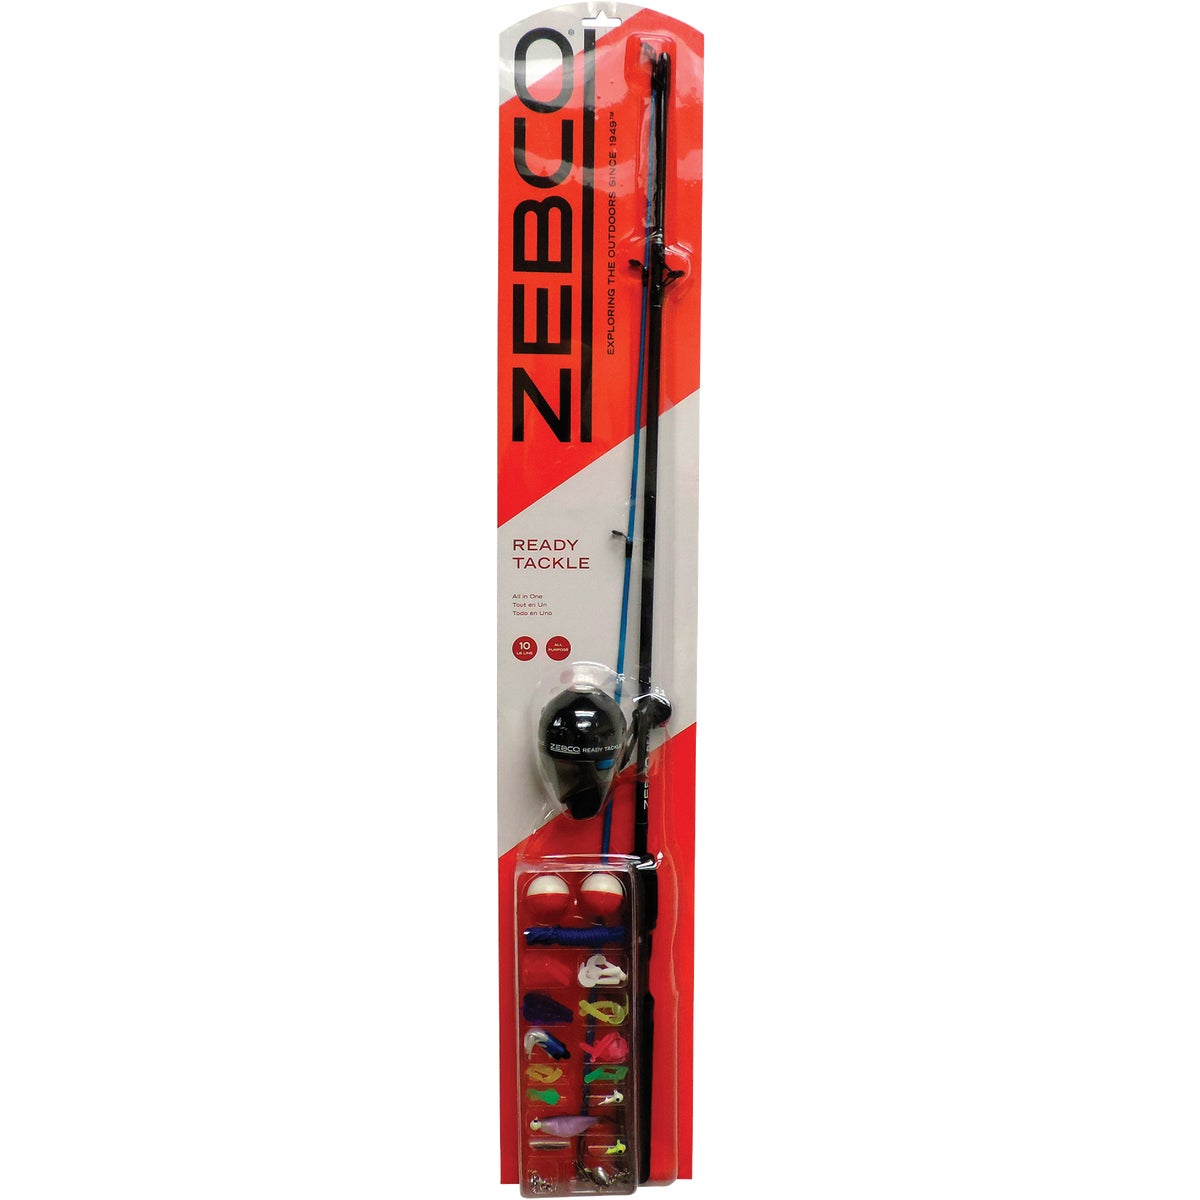 Zebco Corp. 10LB SPINCAST ROD & REEL RTSCK